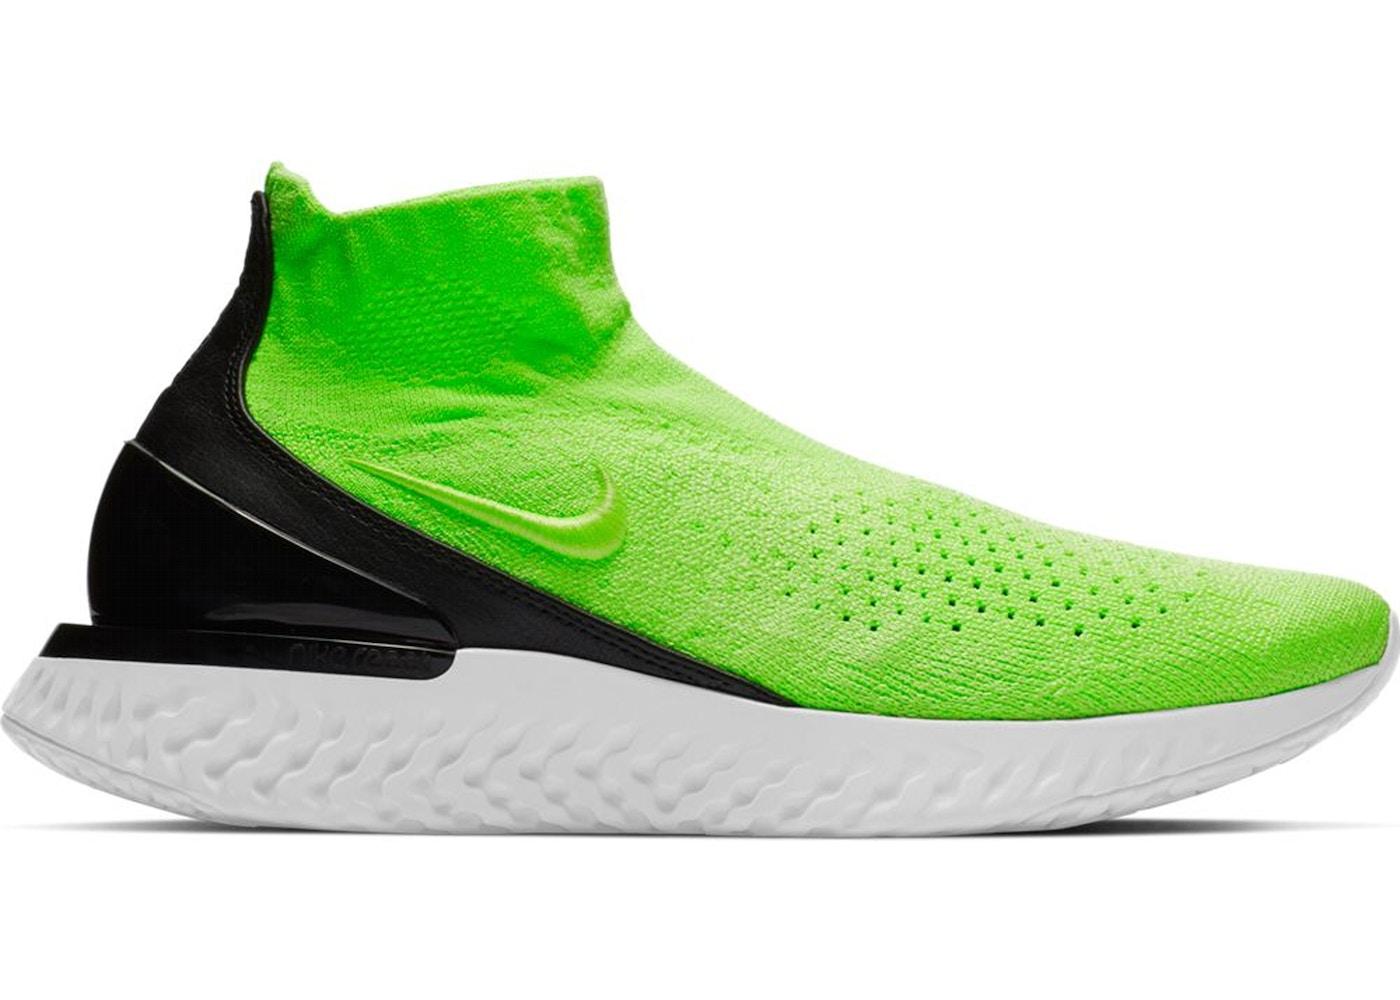 8e927b5a2f34 Nike Rise React Flyknit Lime Blast - AV5554-330